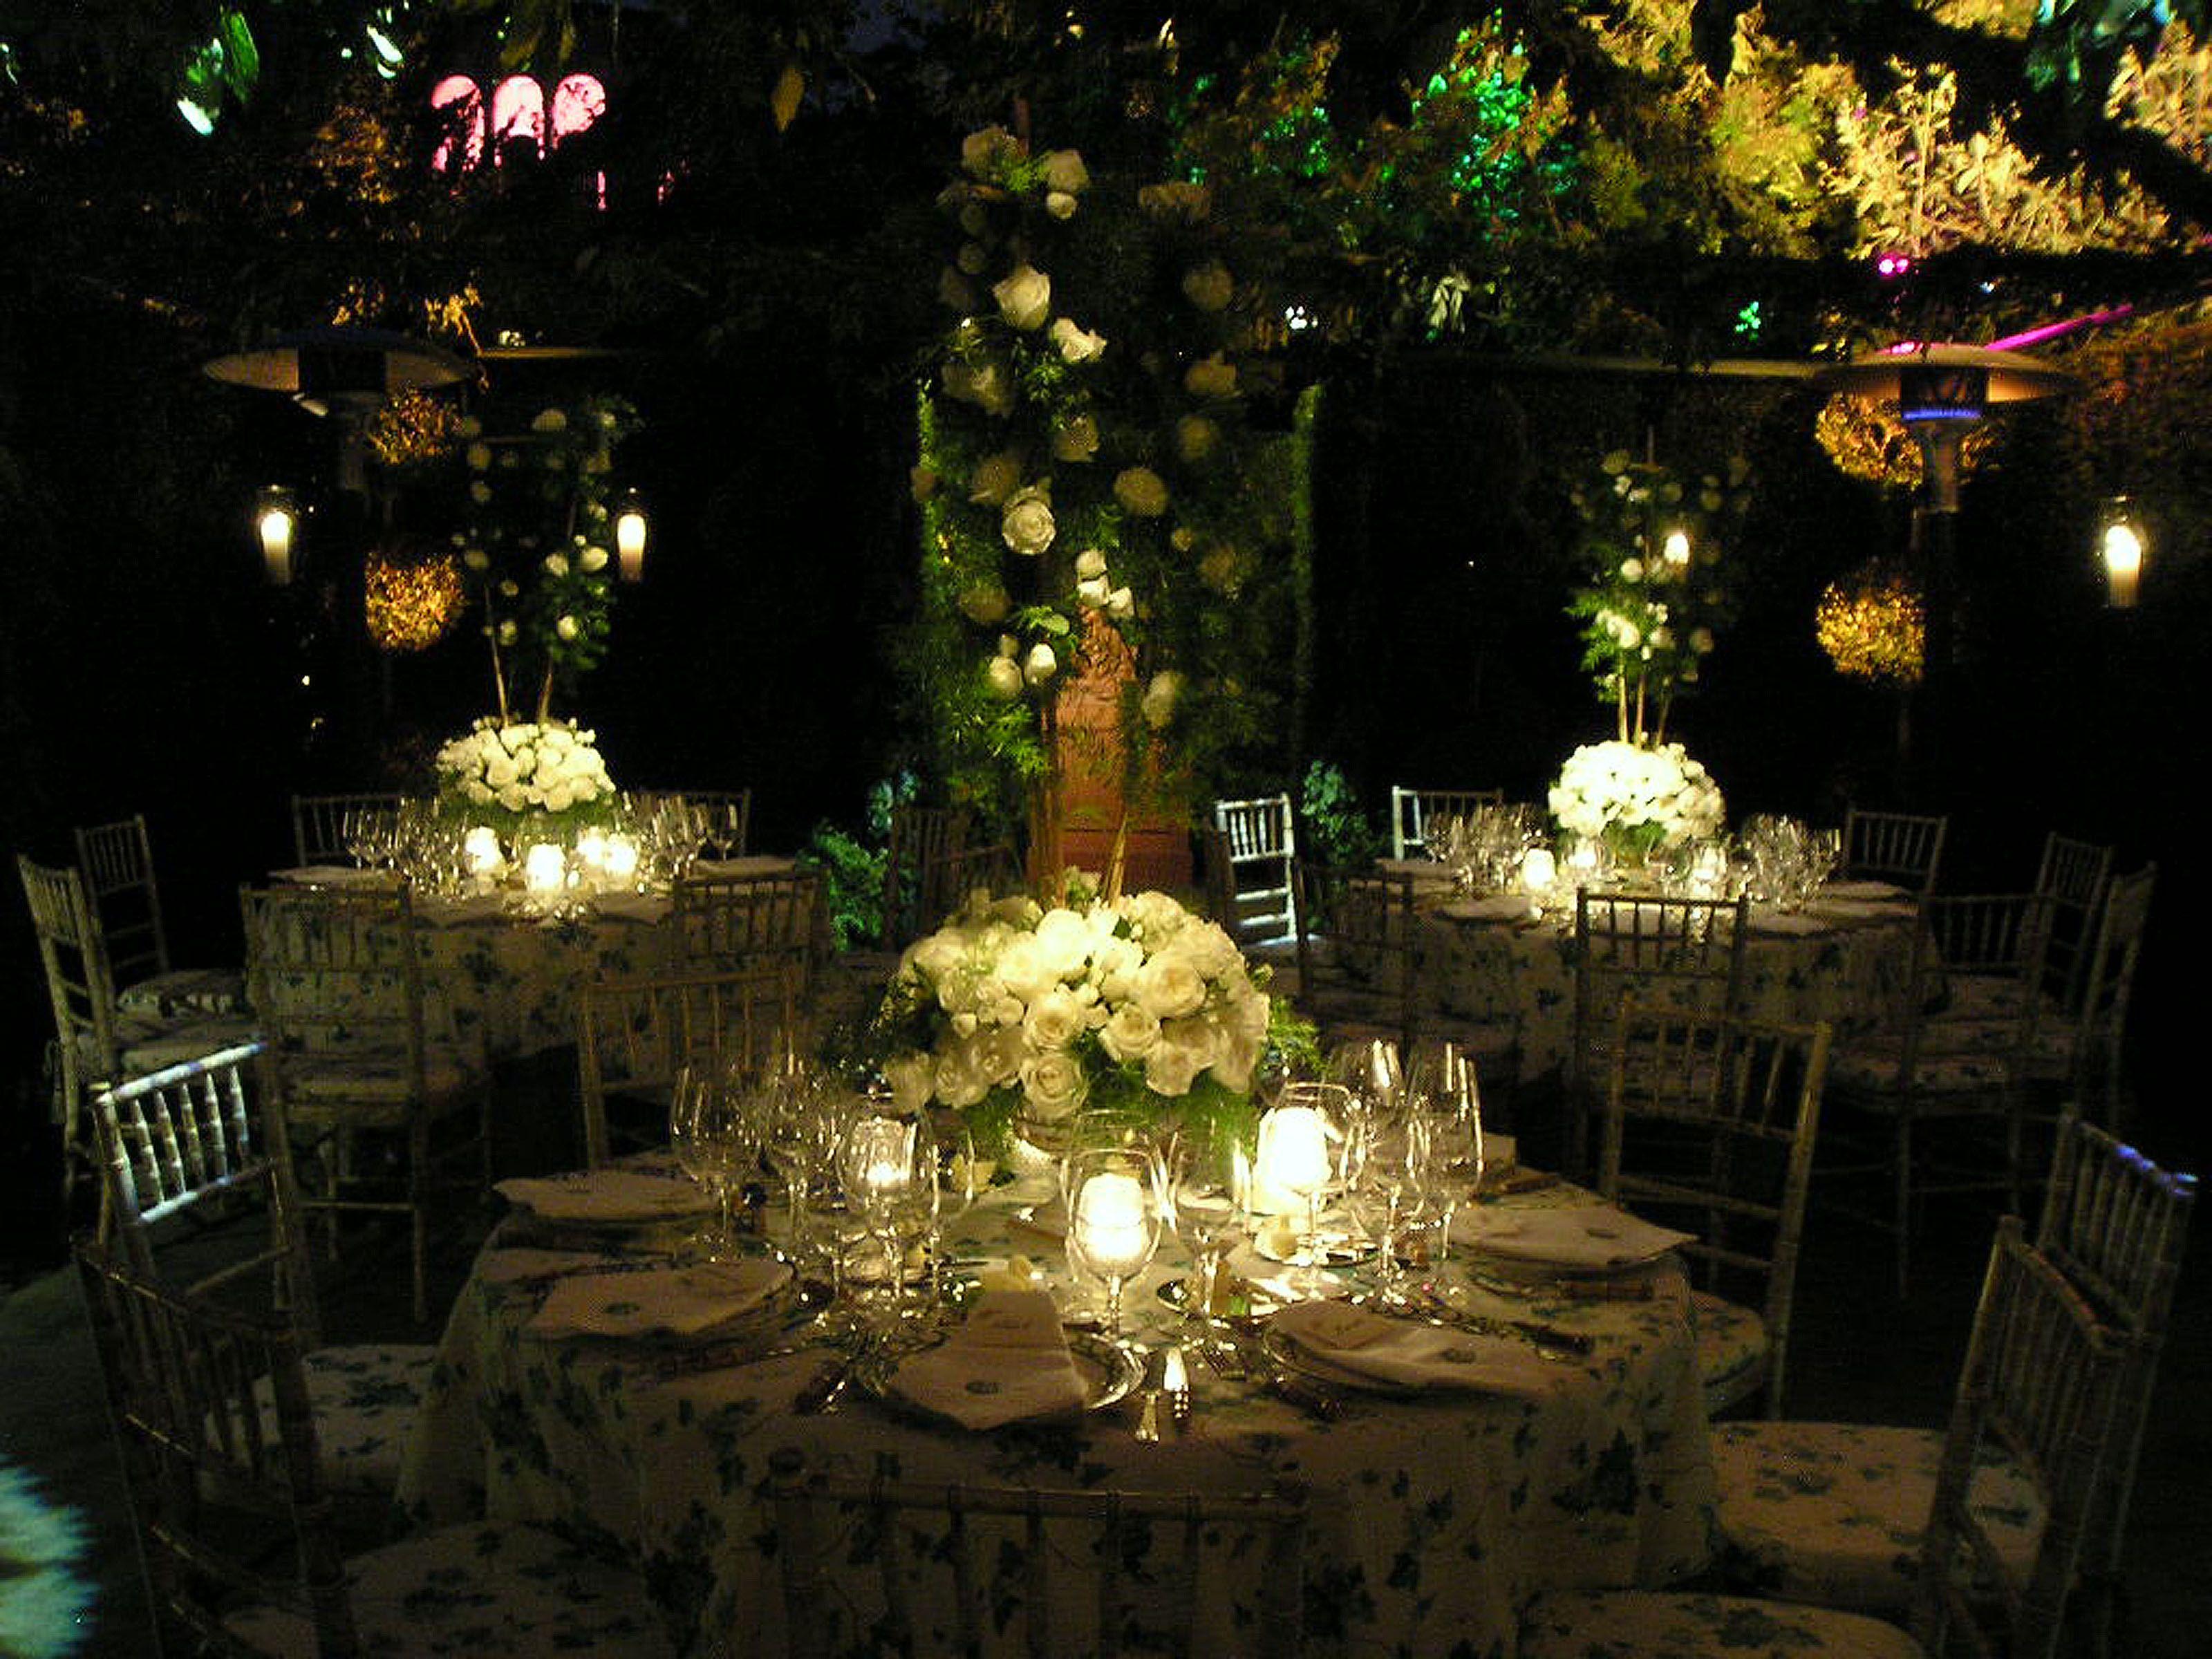 outside lighting ideas for parties. Garden Party Lighting Idea Outside Ideas For Parties I